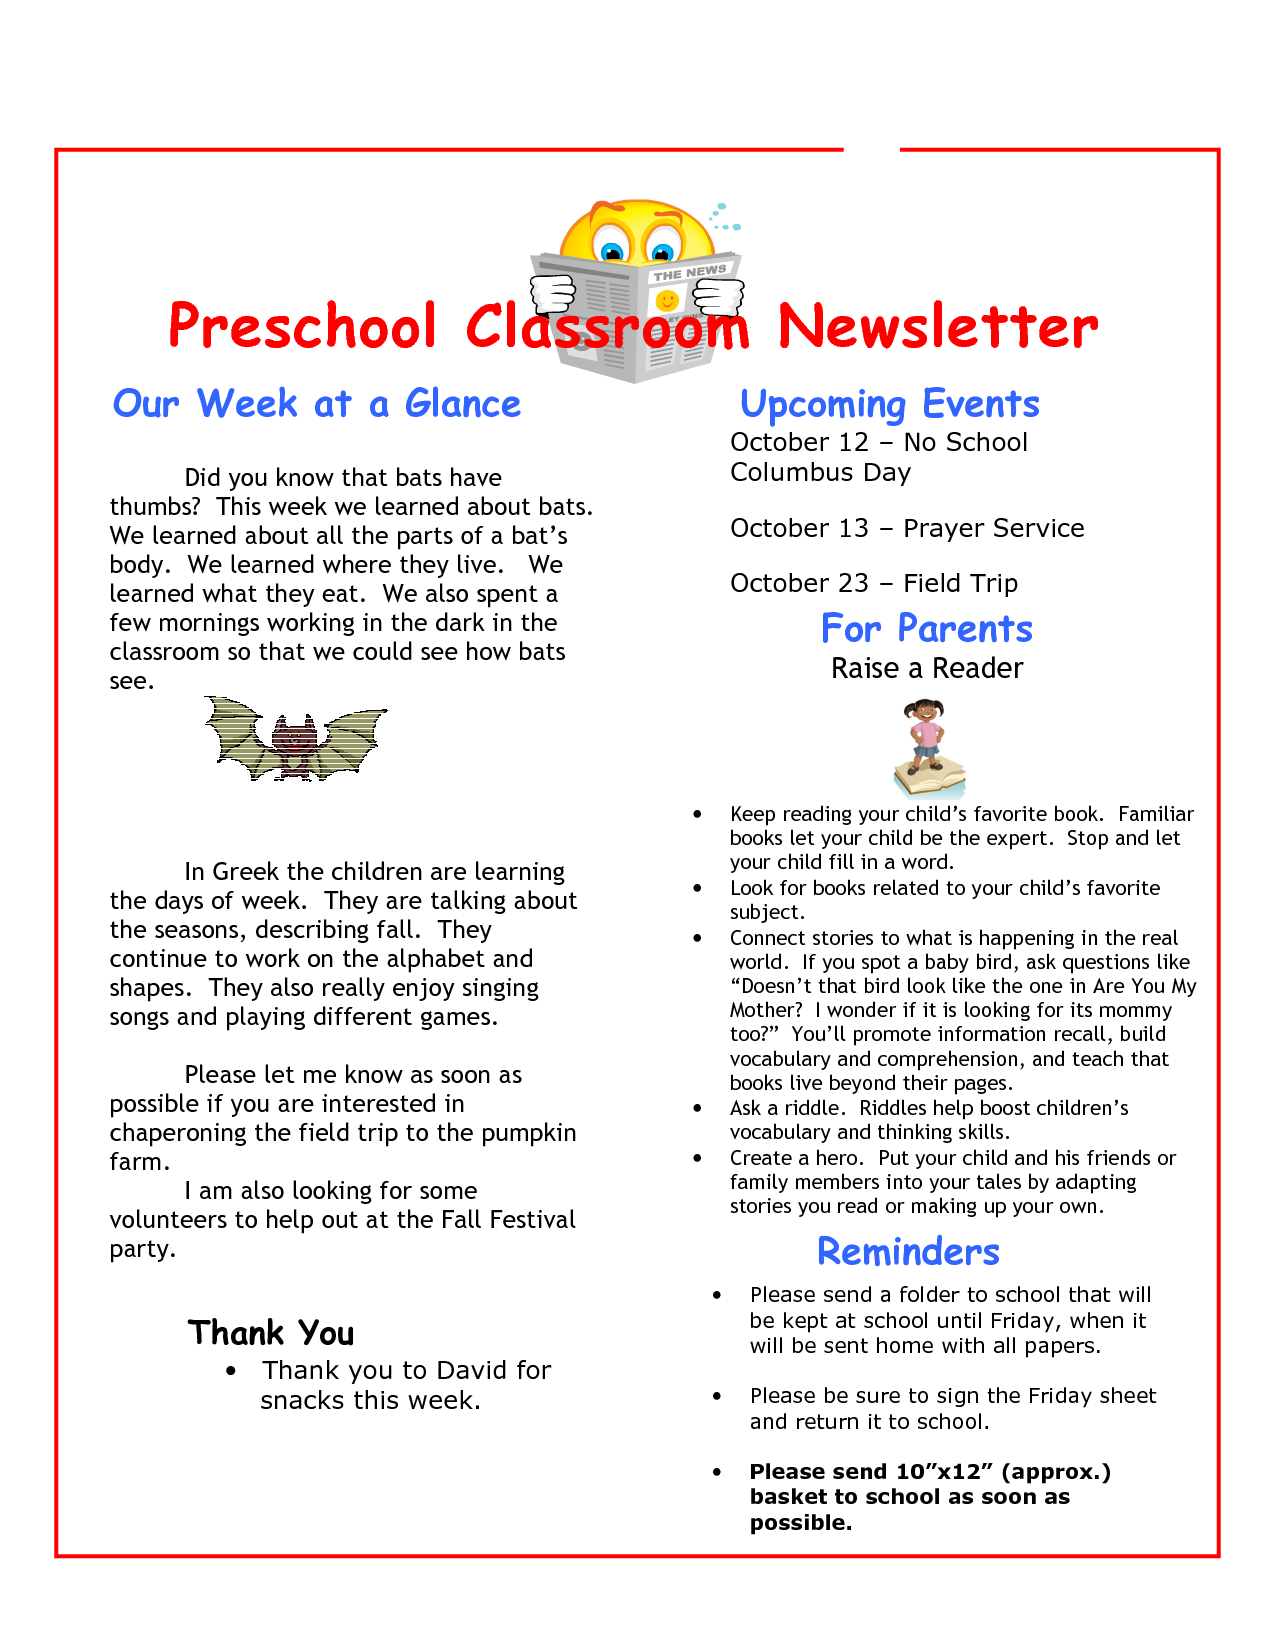 preschool newsletter quotes quotesgram. Black Bedroom Furniture Sets. Home Design Ideas